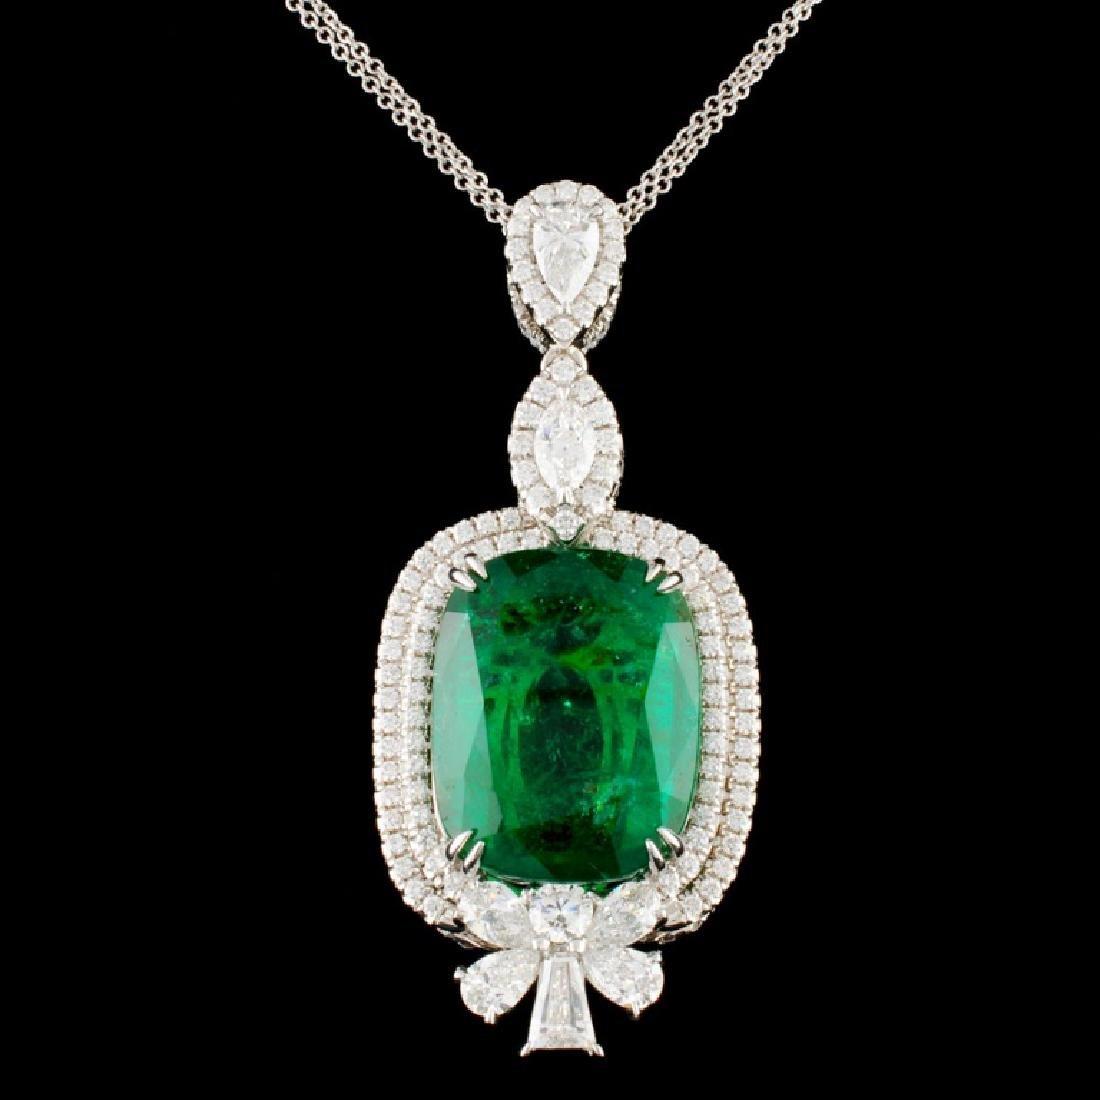 18K Gold 21.83ct Emerald & 4.44ctw Diamond Pendant